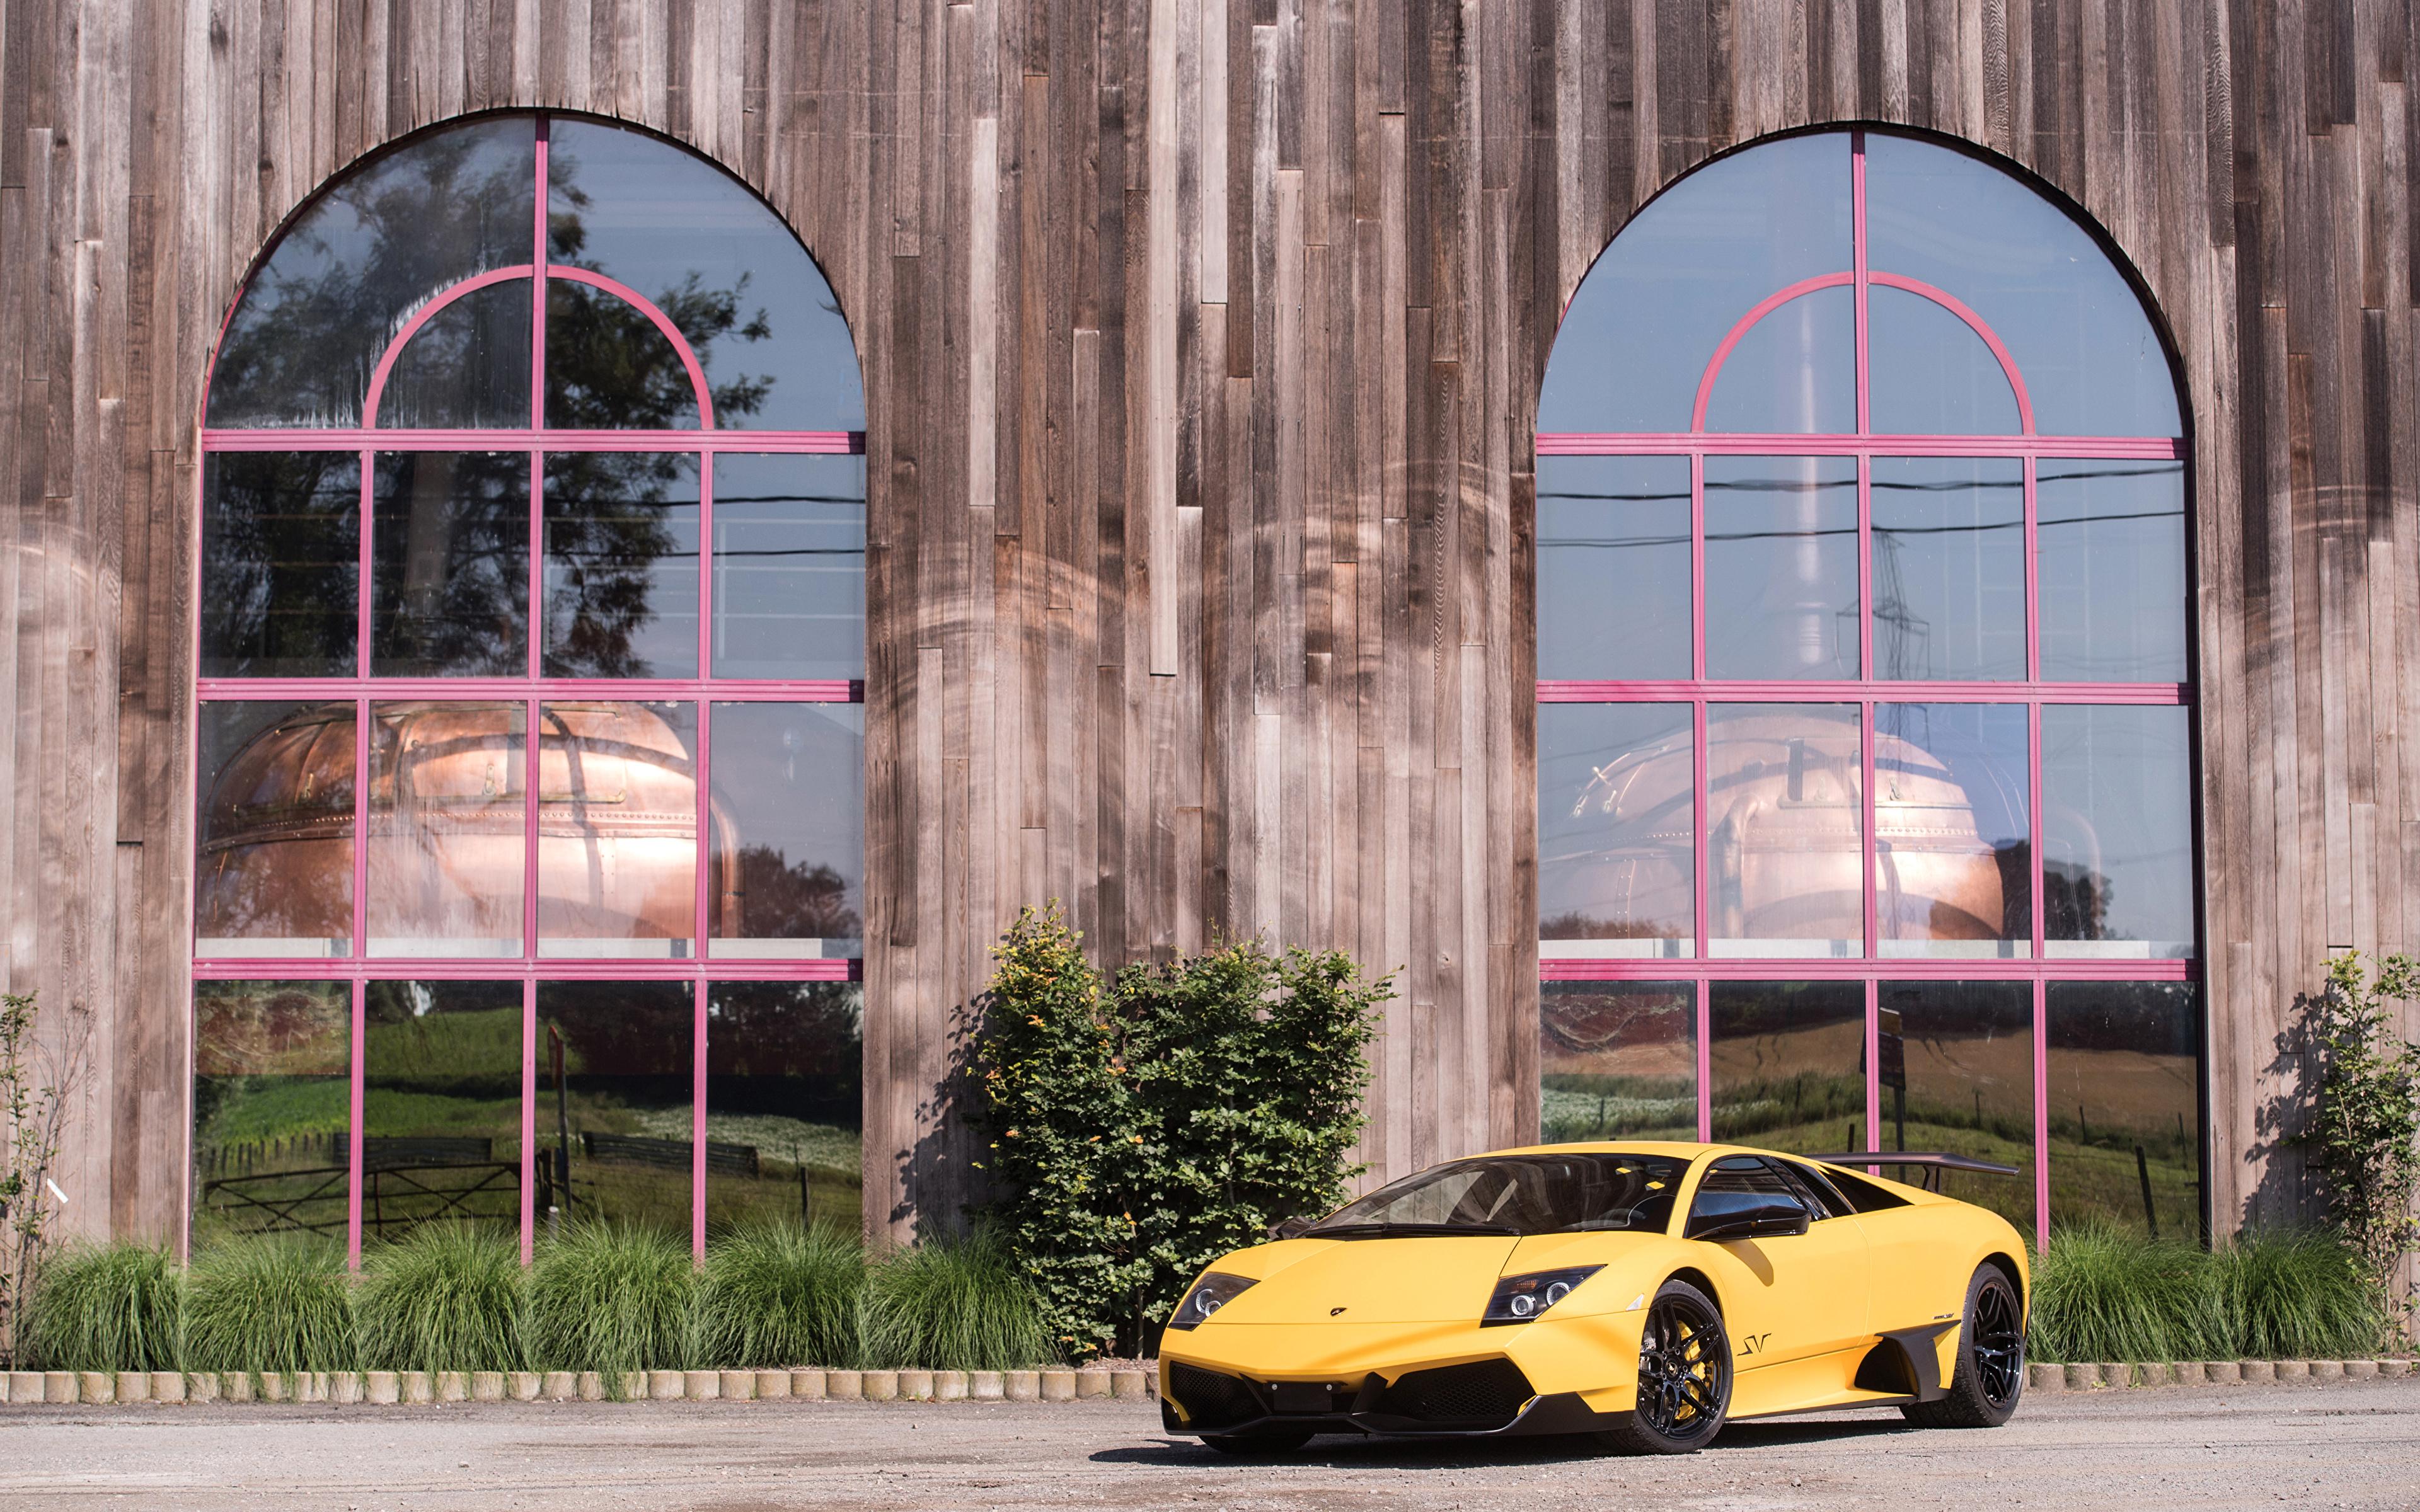 Картинки 2009-10 Lamborghini Murciélago LP 670-4 SuperVeloce Worldwide Желтый Автомобили 3840x2400 Ламборгини желтых желтые желтая авто машина машины автомобиль